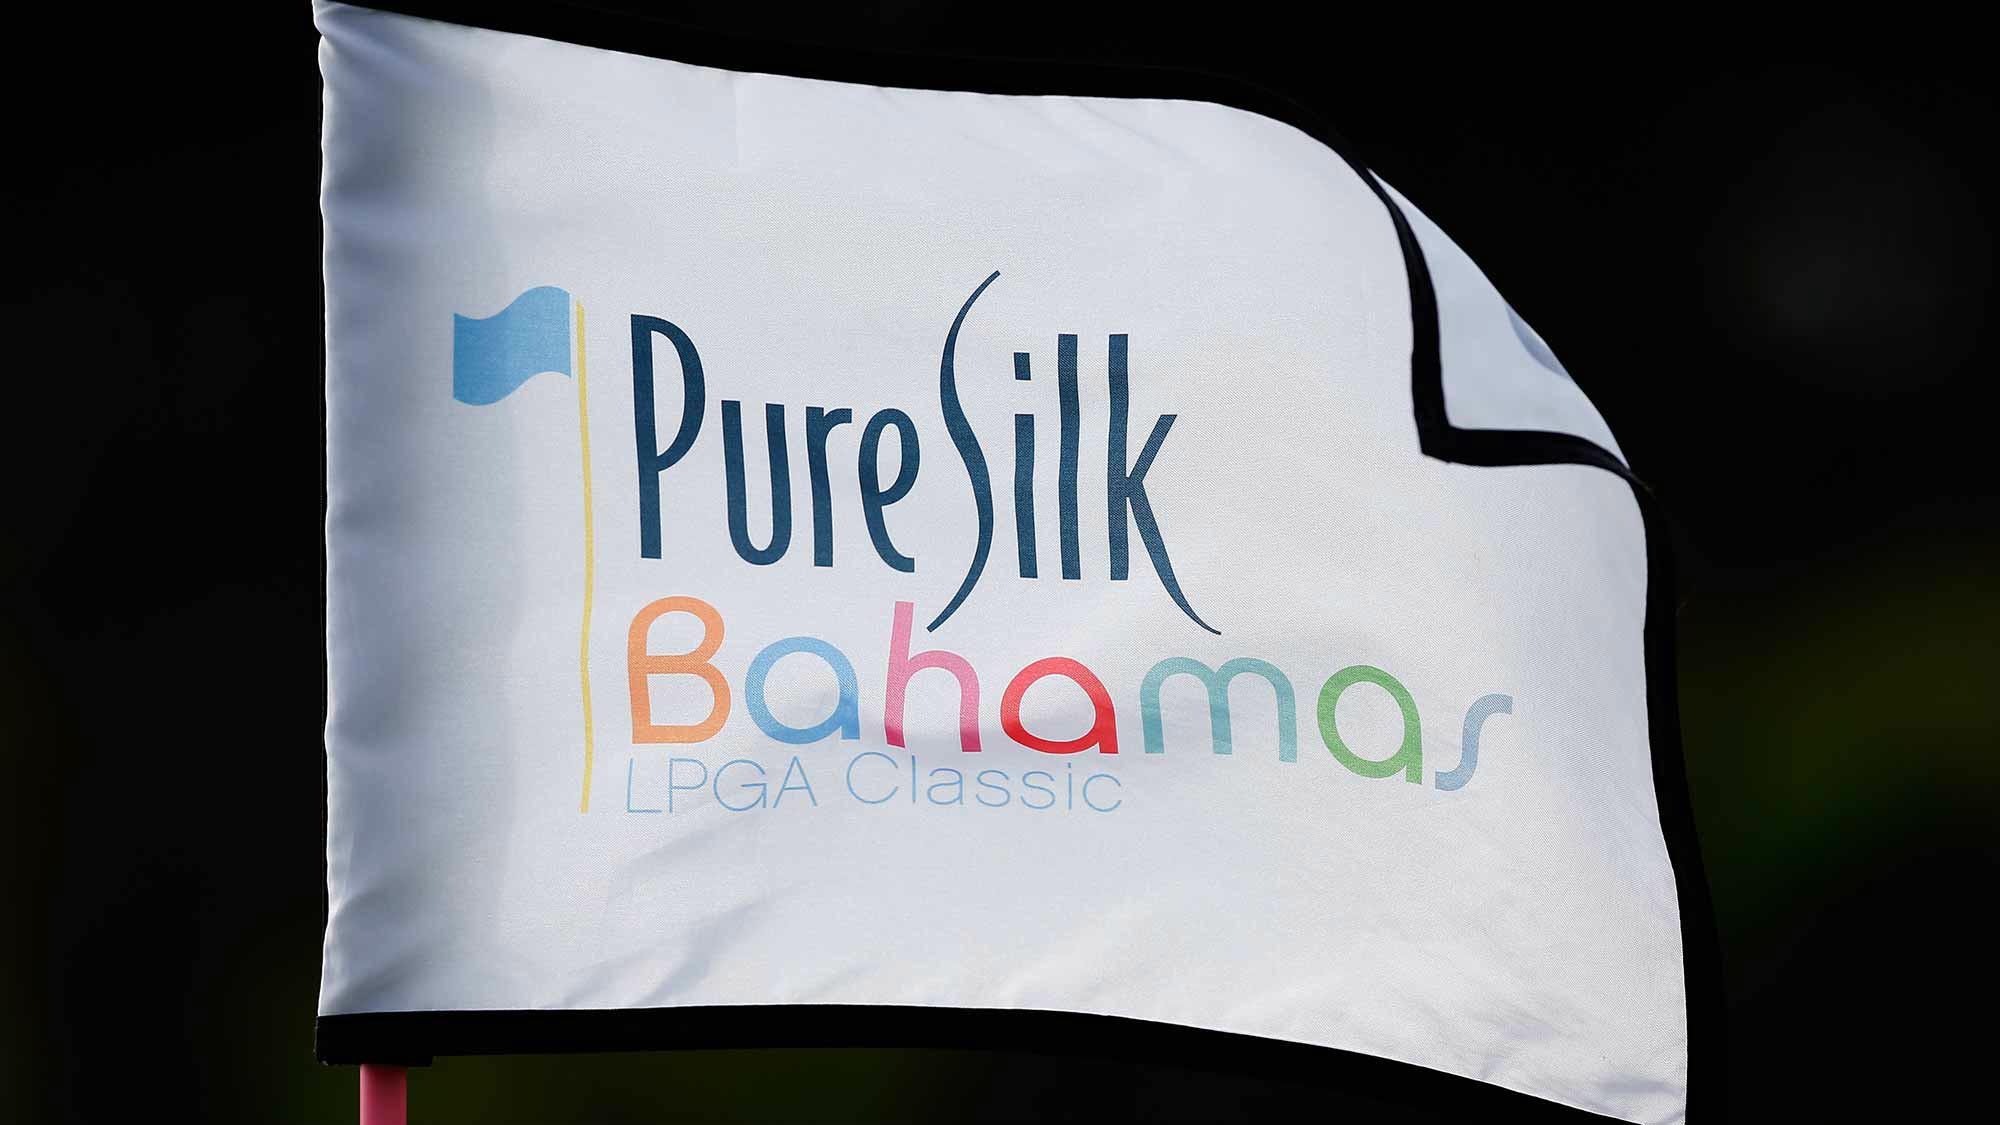 Image result for Pure silk lpga bahamas classic 2017